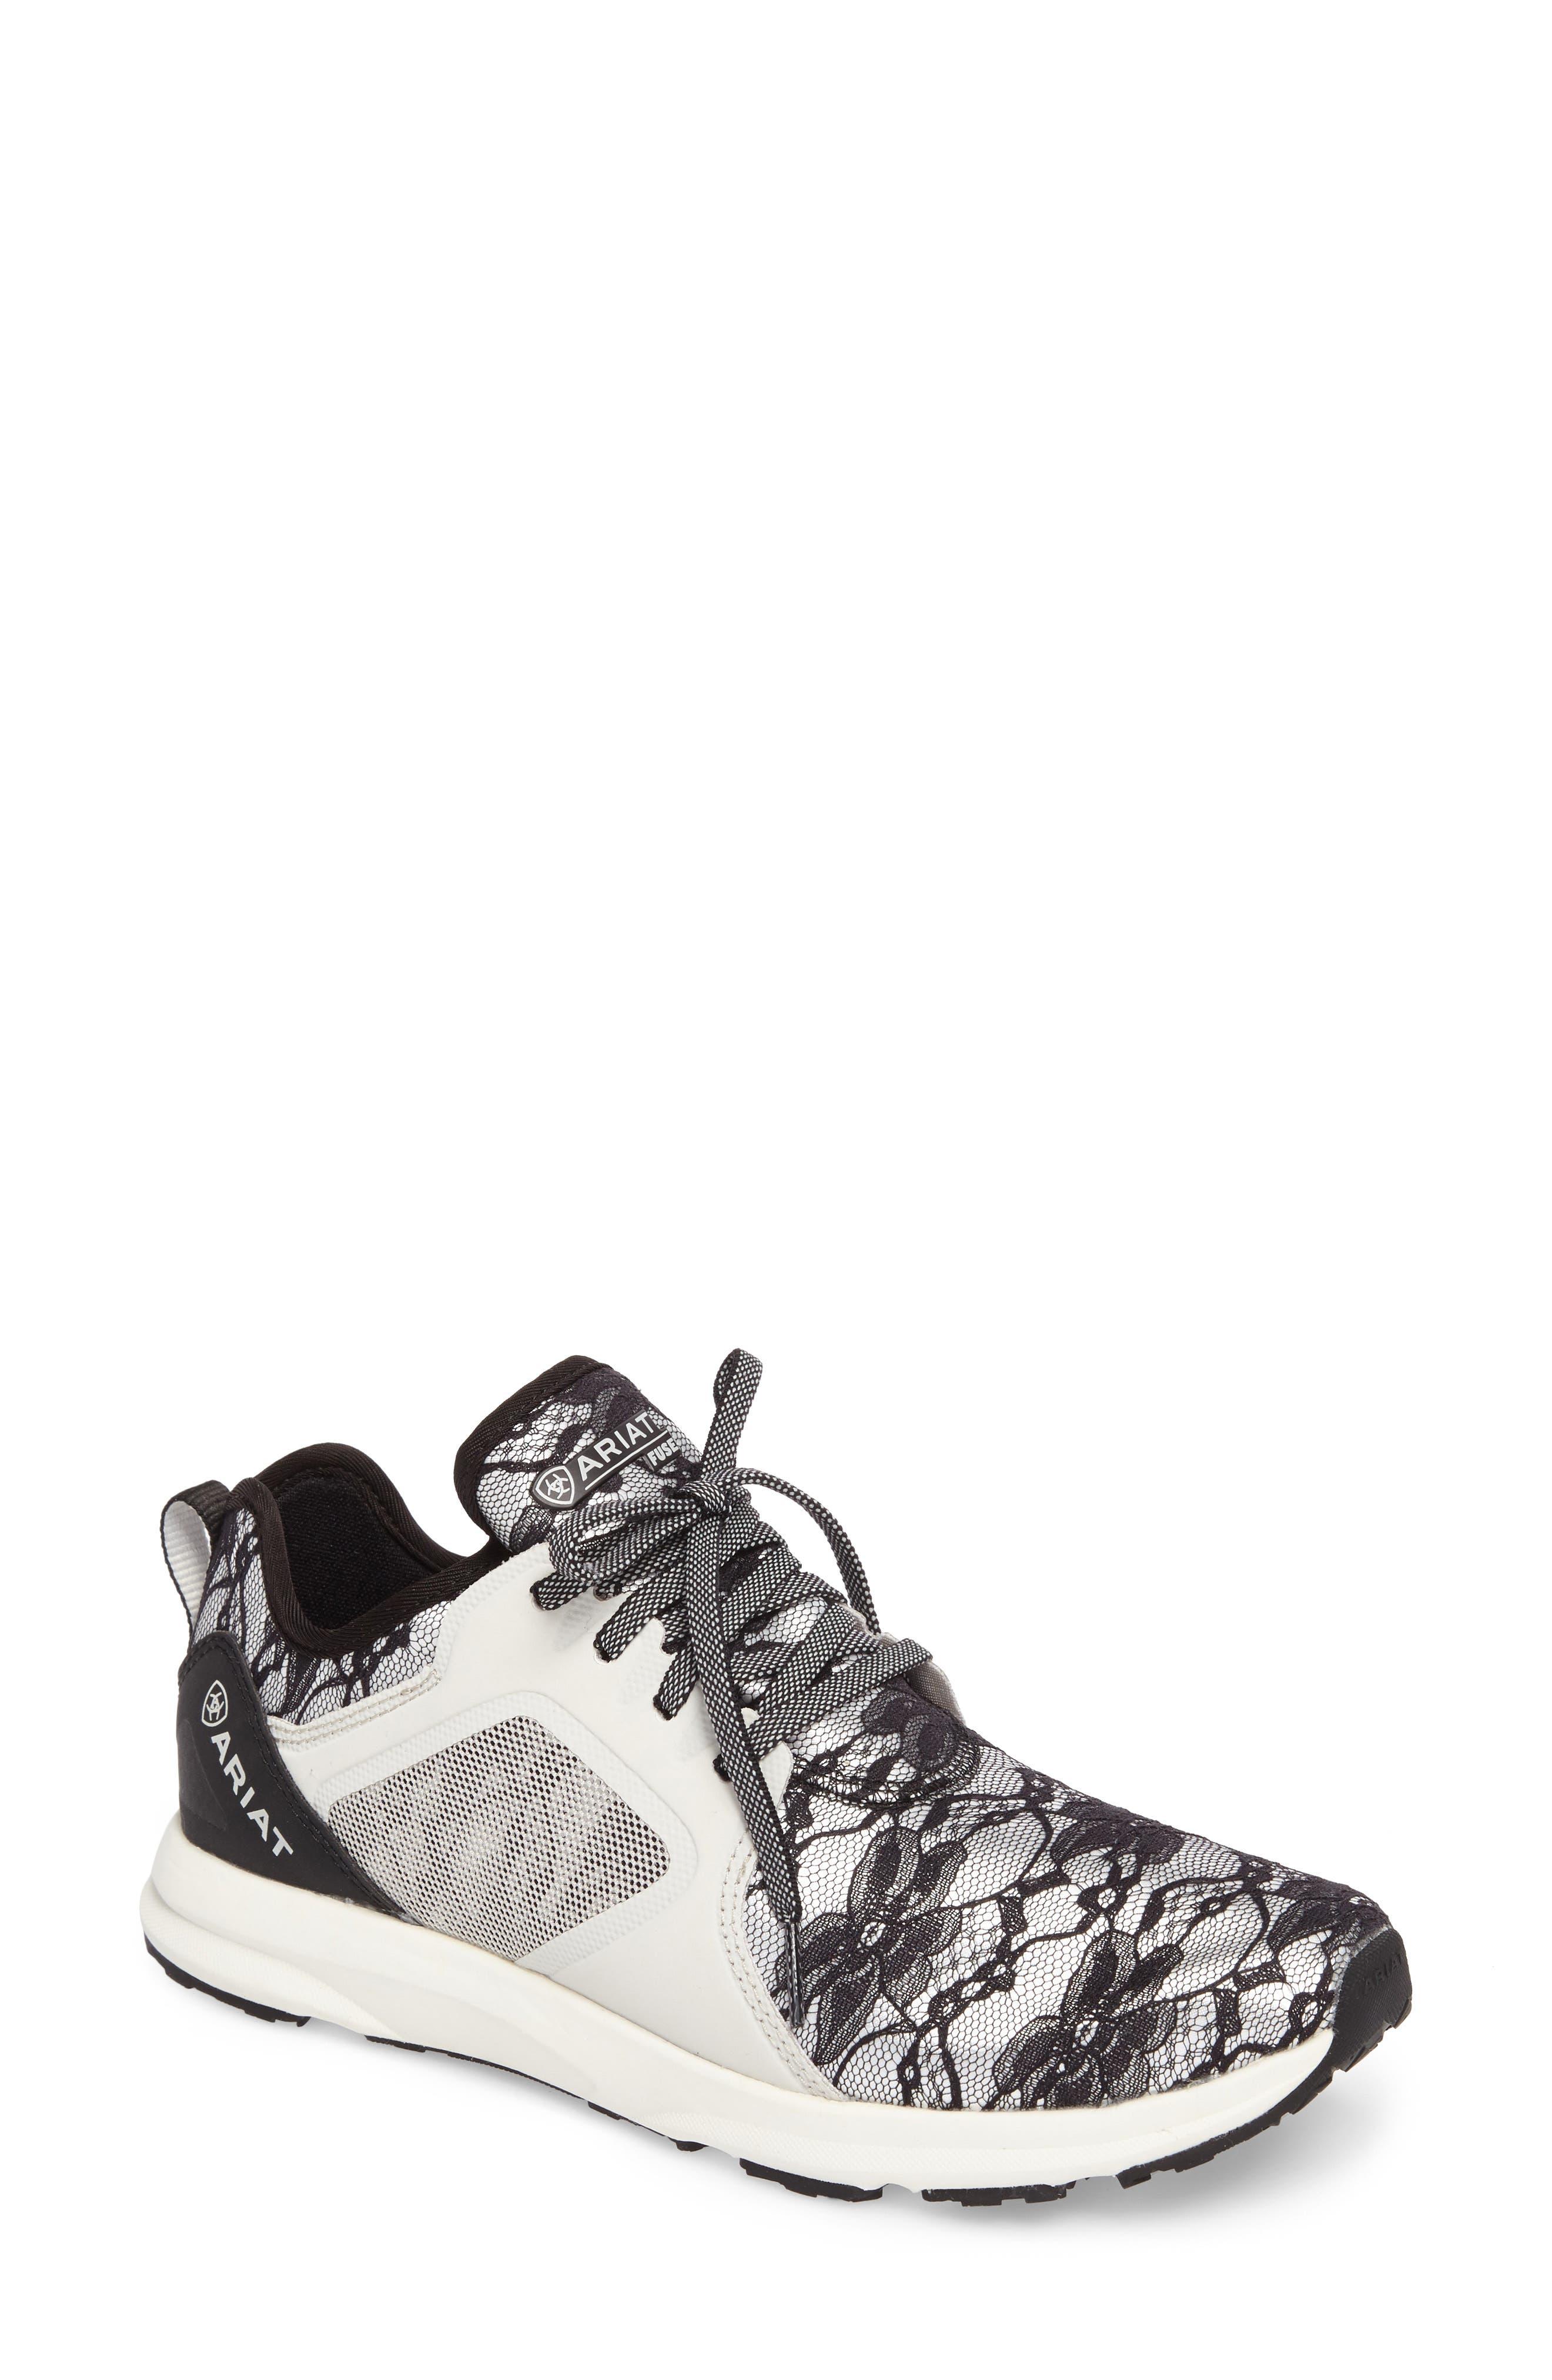 Fuse Print Sneaker,                             Main thumbnail 1, color,                             Black Lace